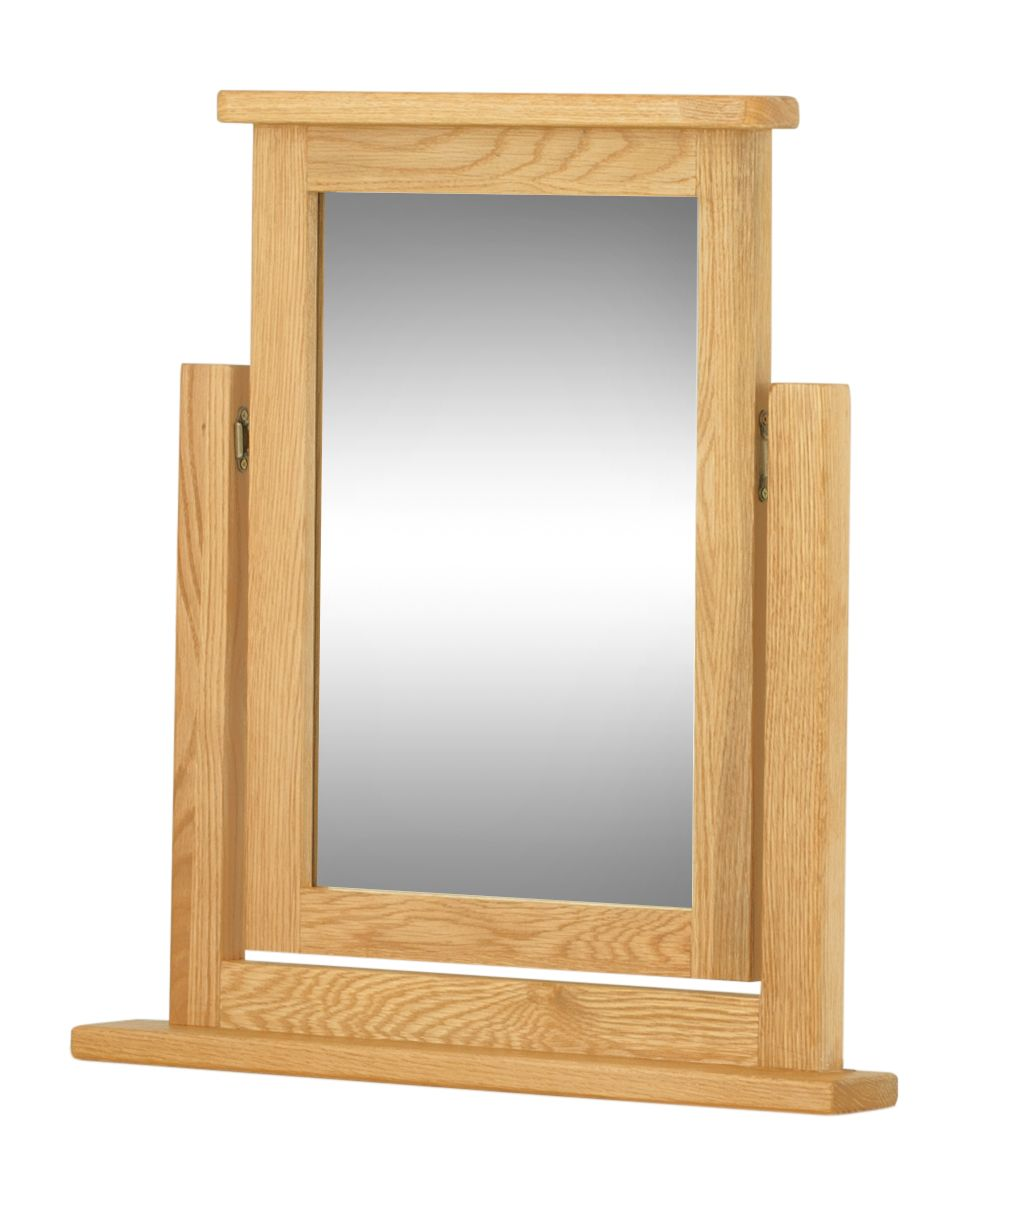 PRESTON GRAND Swing Dressing Table Mirror